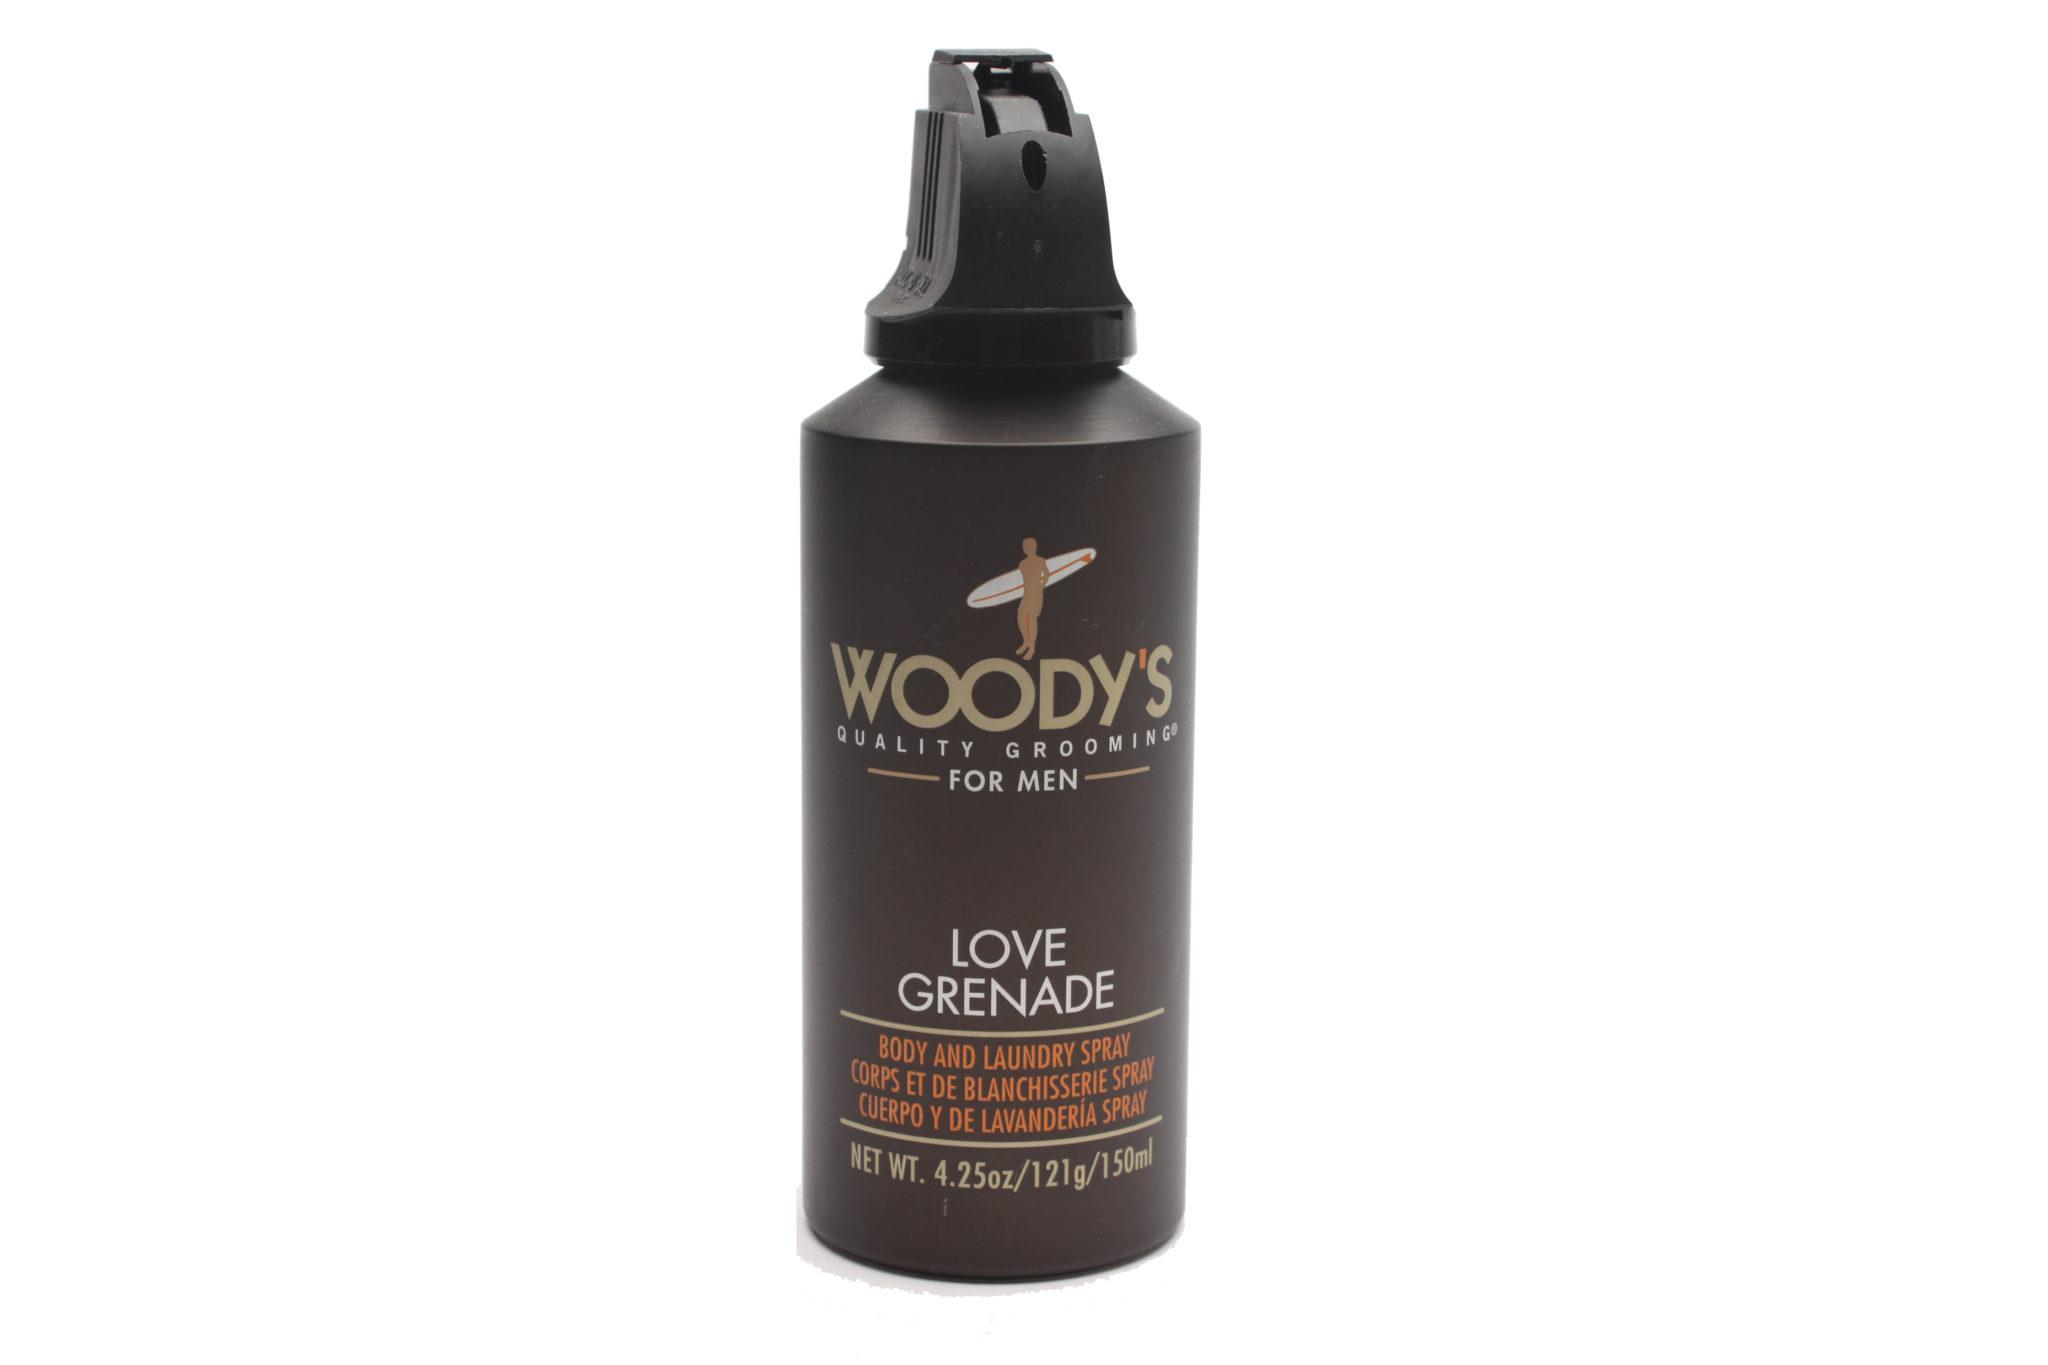 34259 Love Grenade Spray 4.25 oz Front